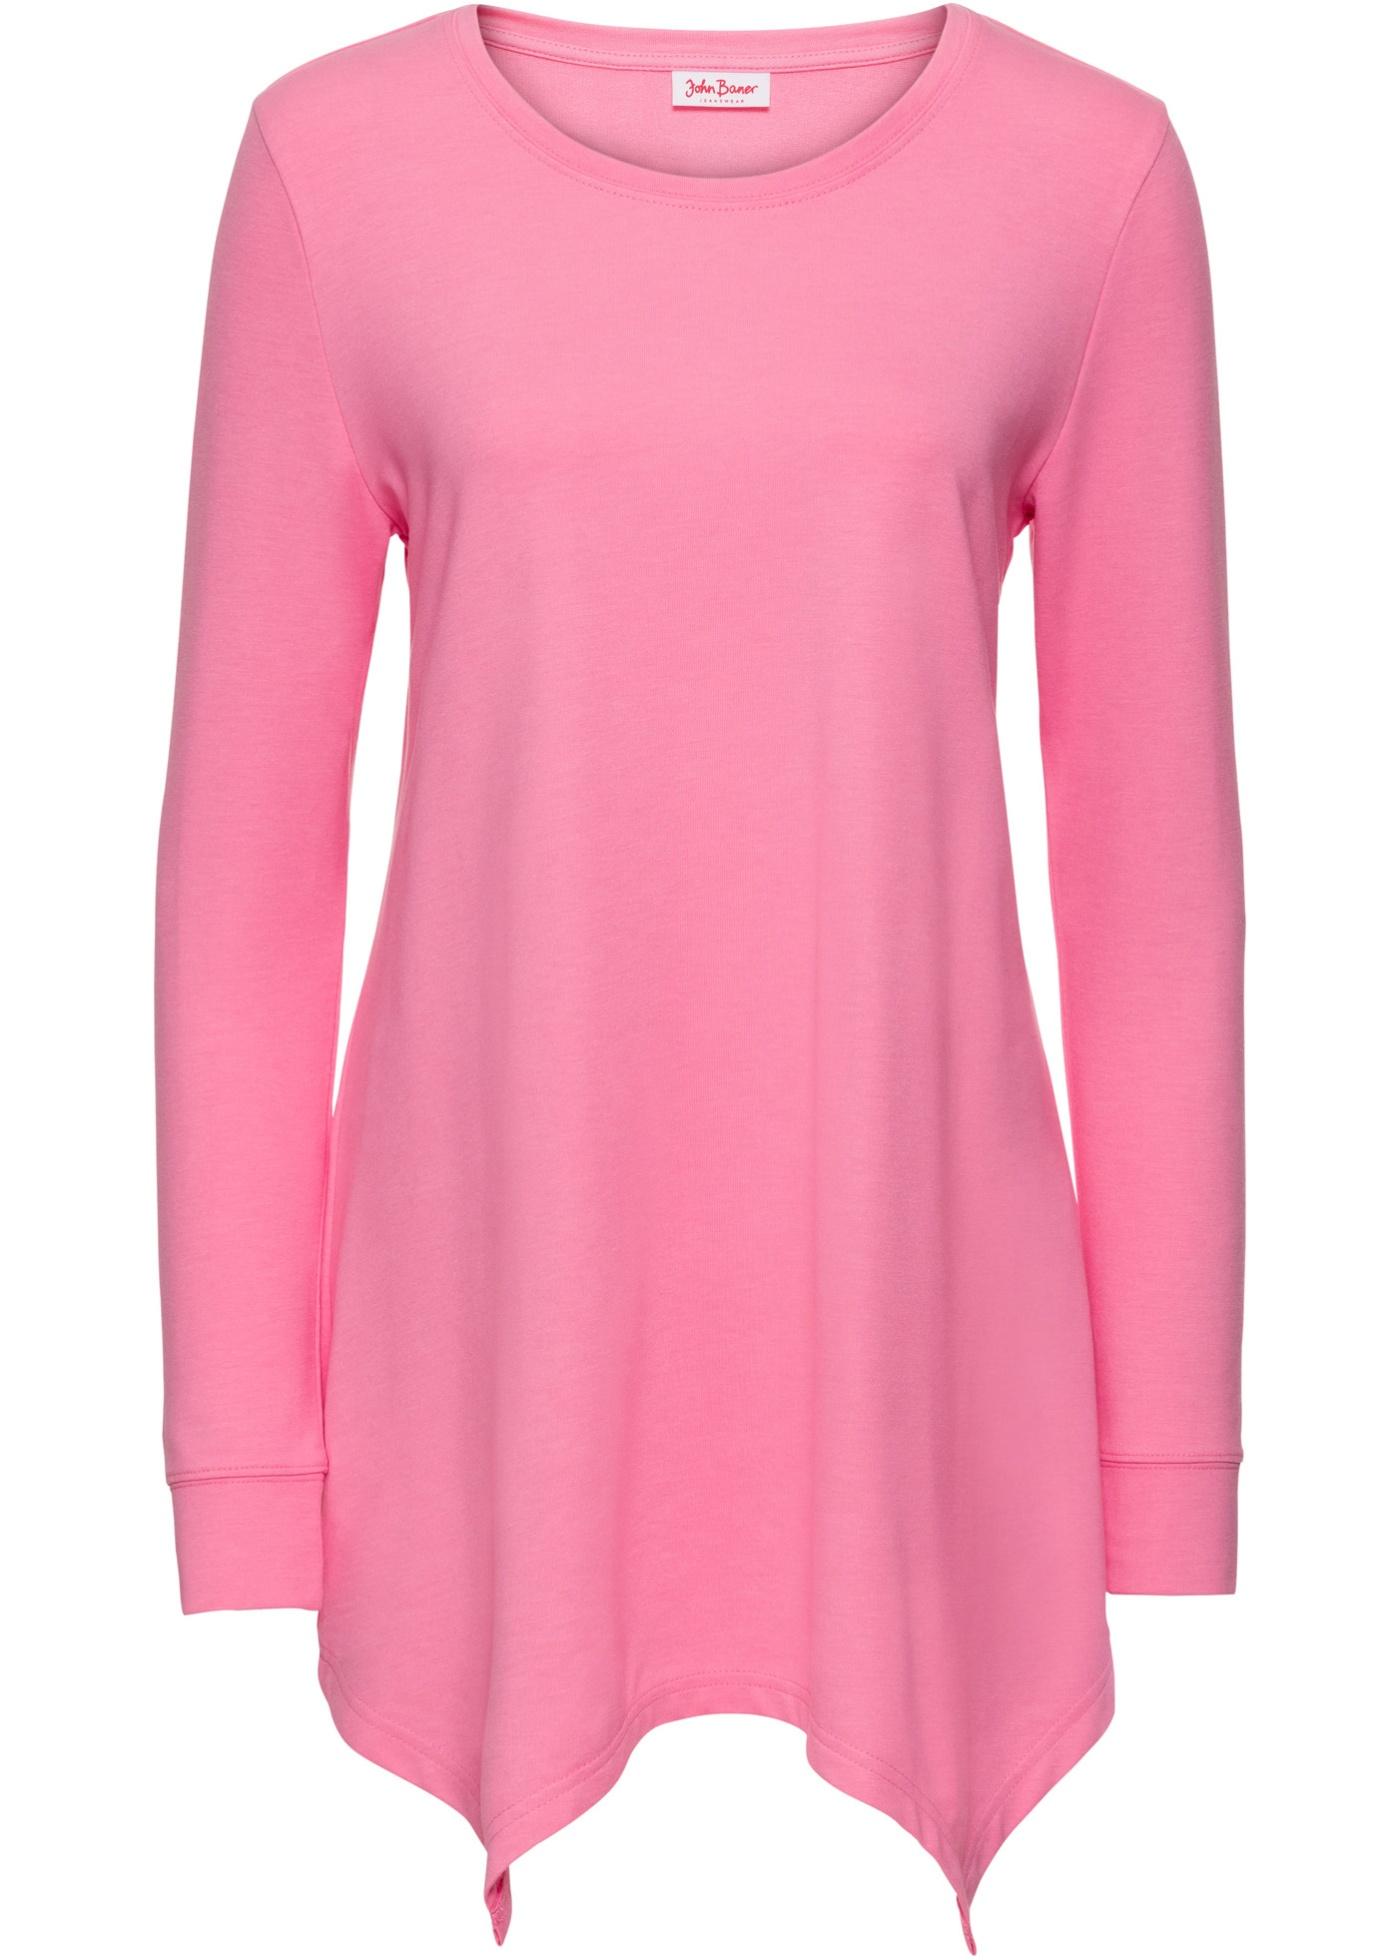 Langarm-Sweatshirt mit Zipfelsaum